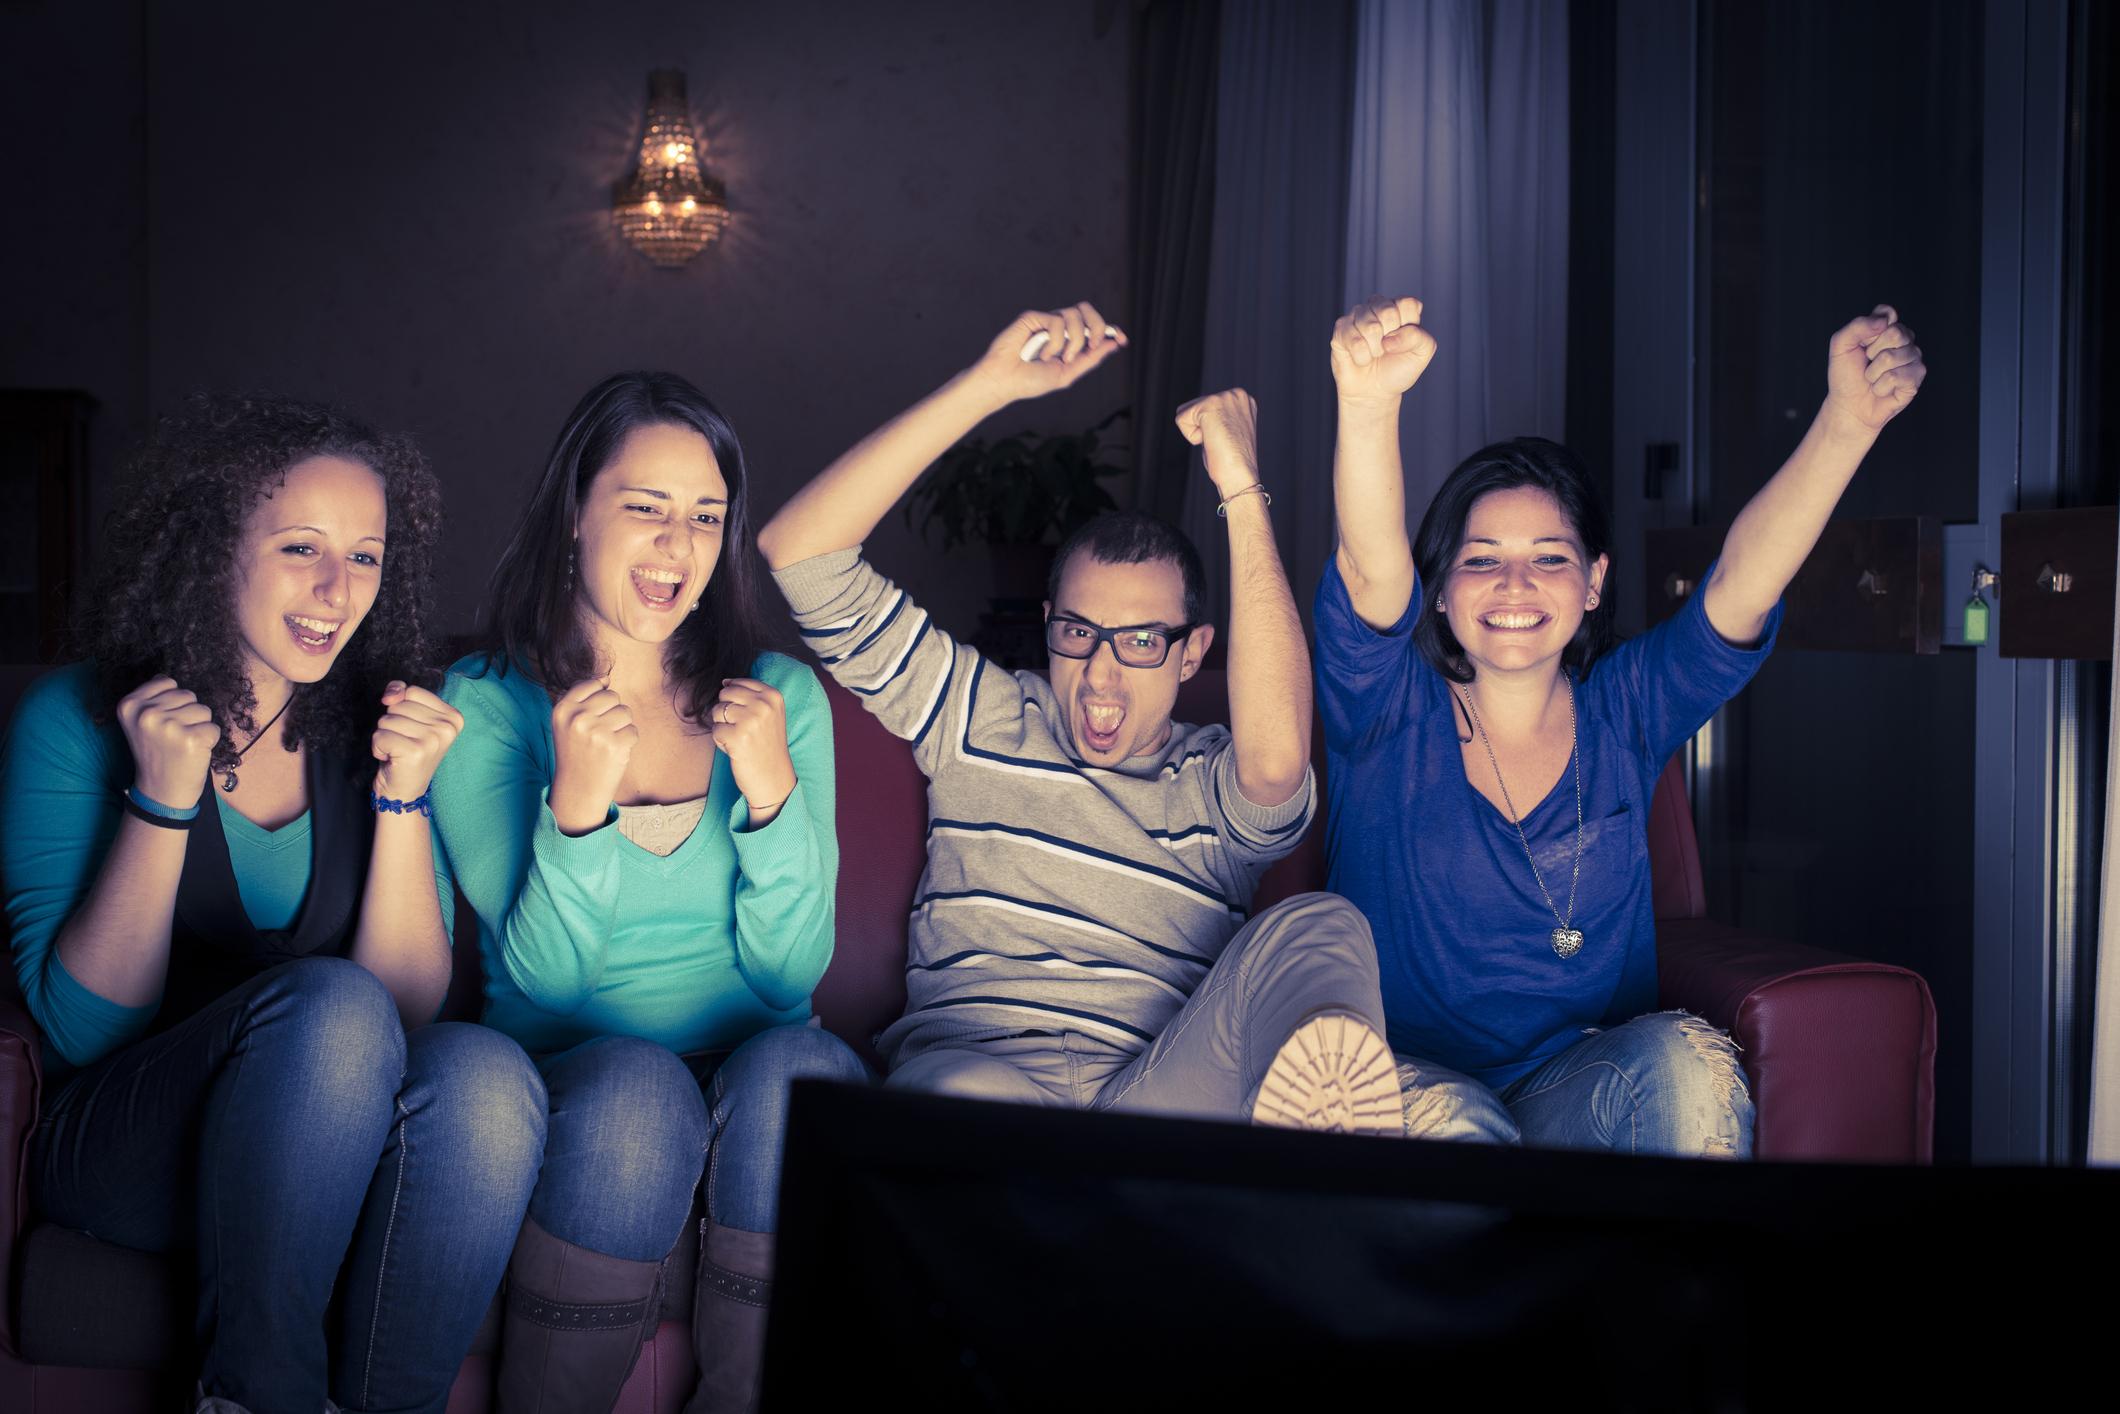 Four-teenager-watching-tv-158664727_2121x1416.jpeg